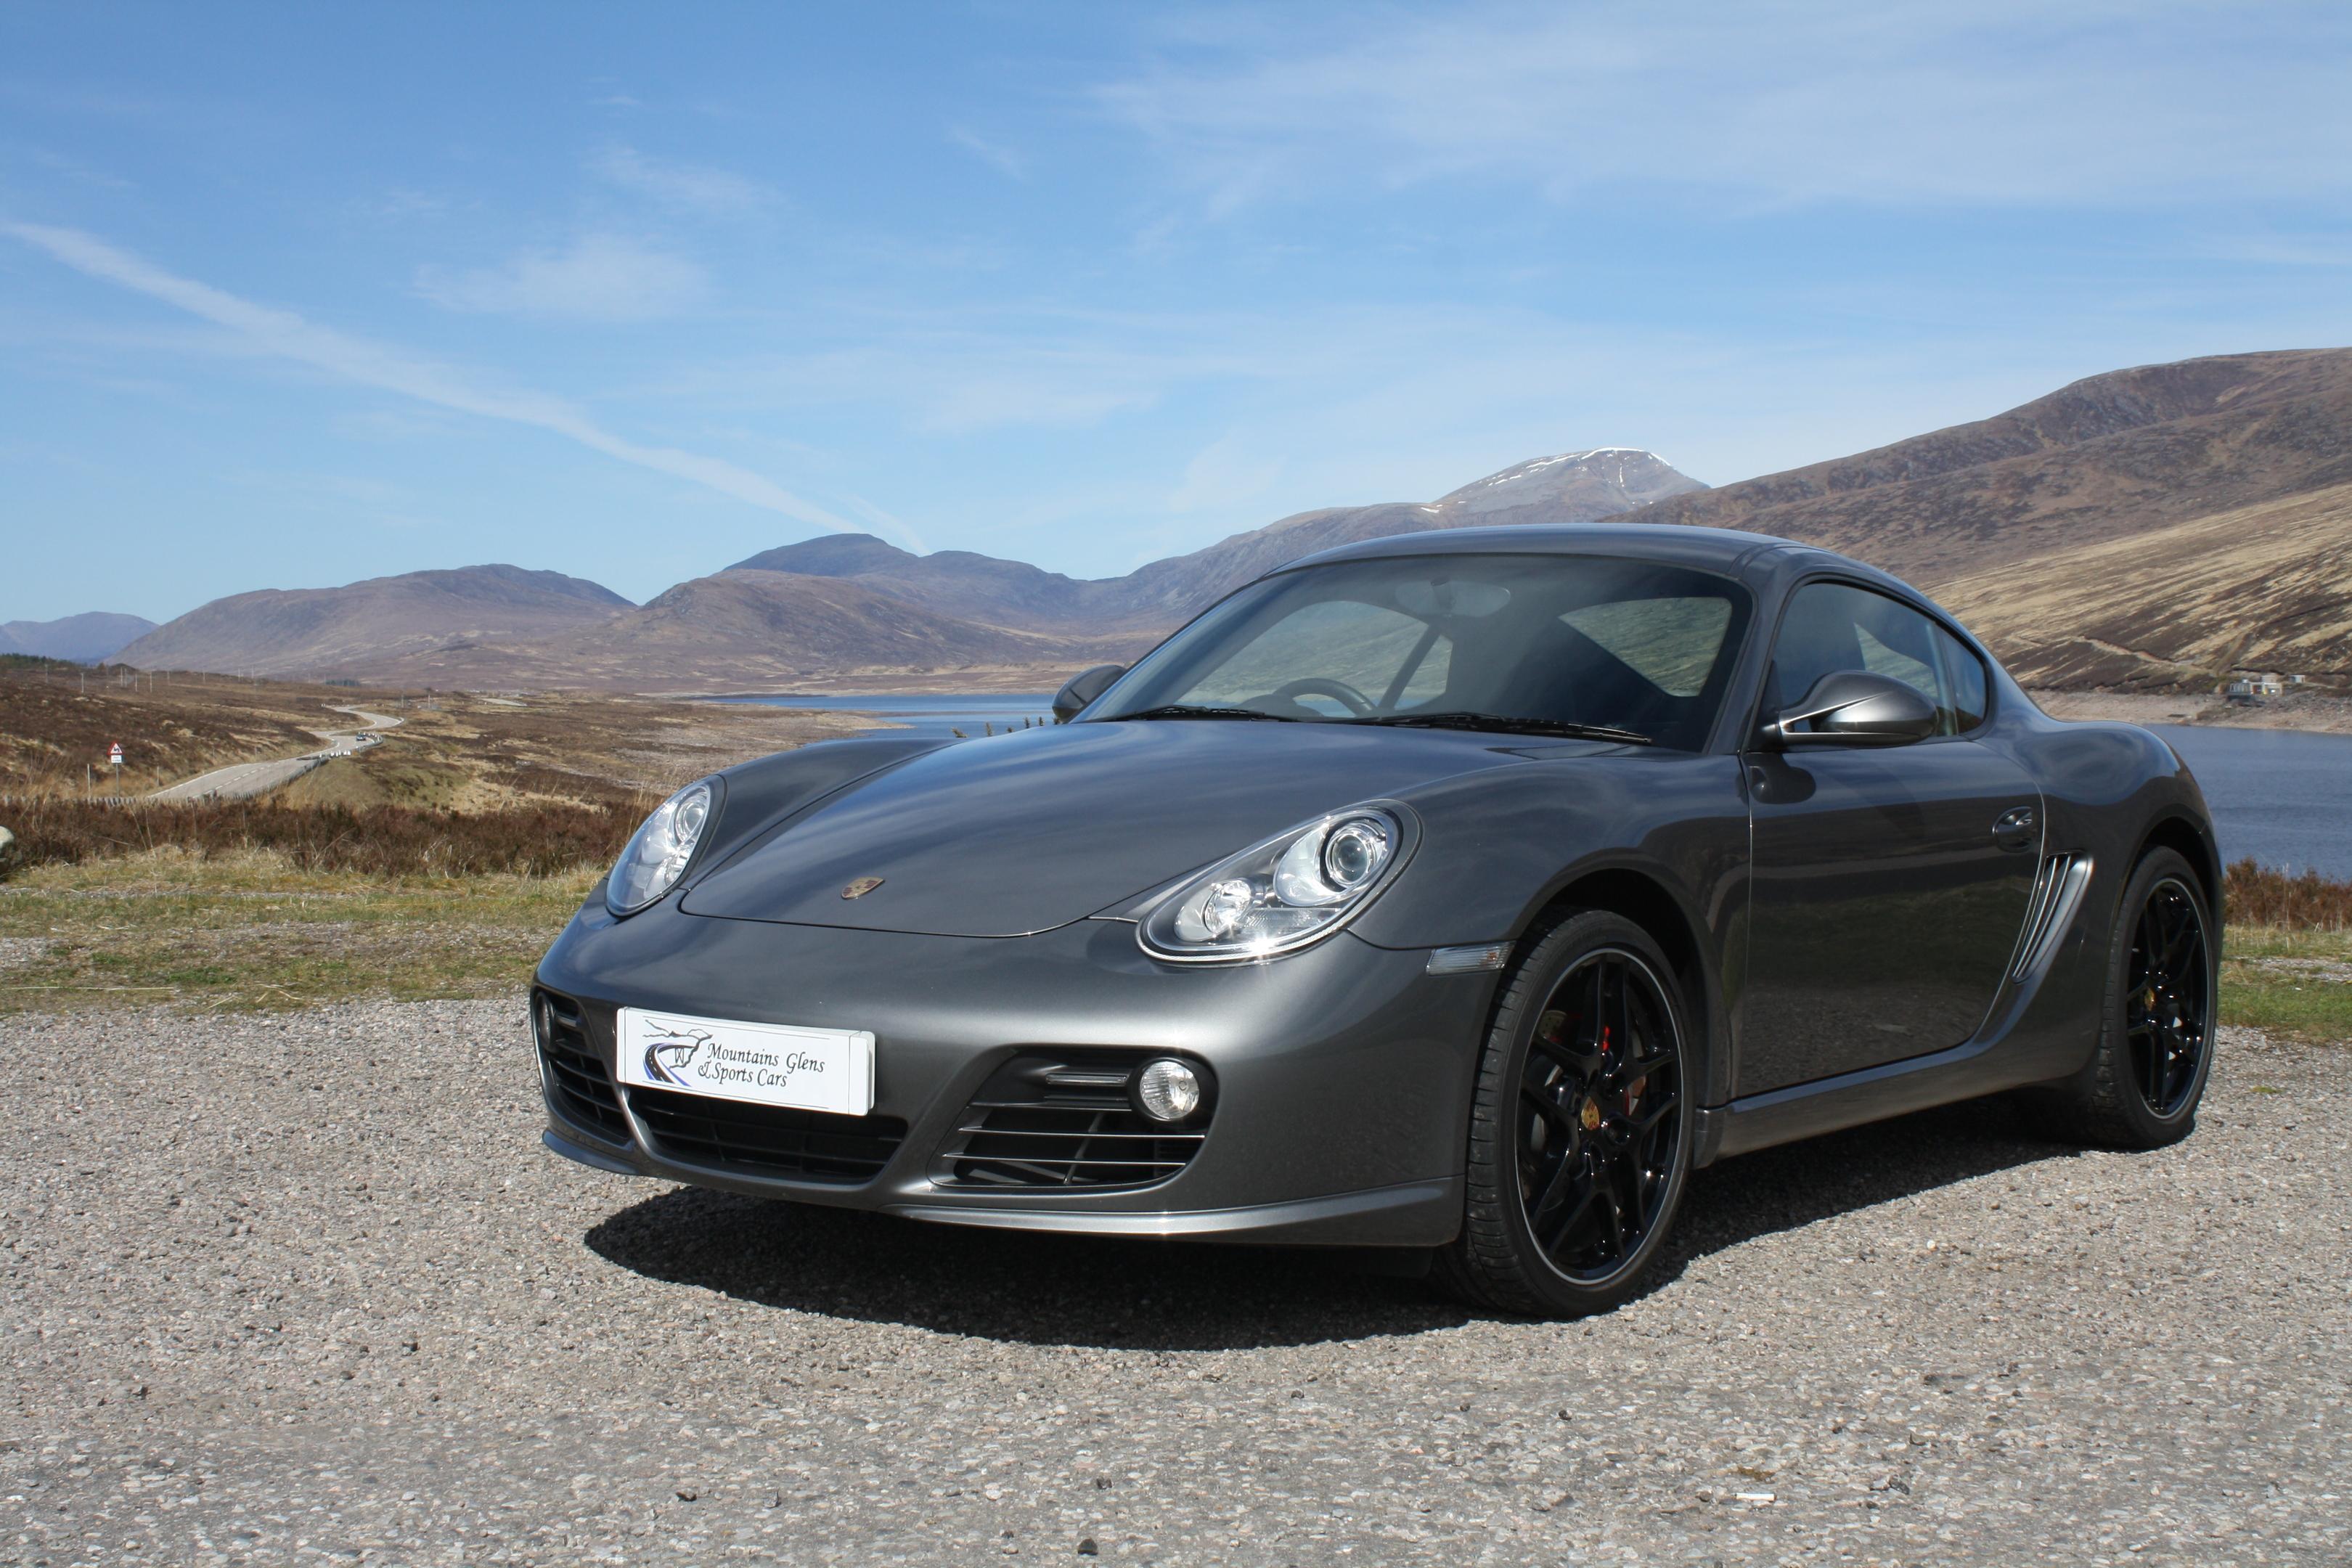 Porsche lead photo